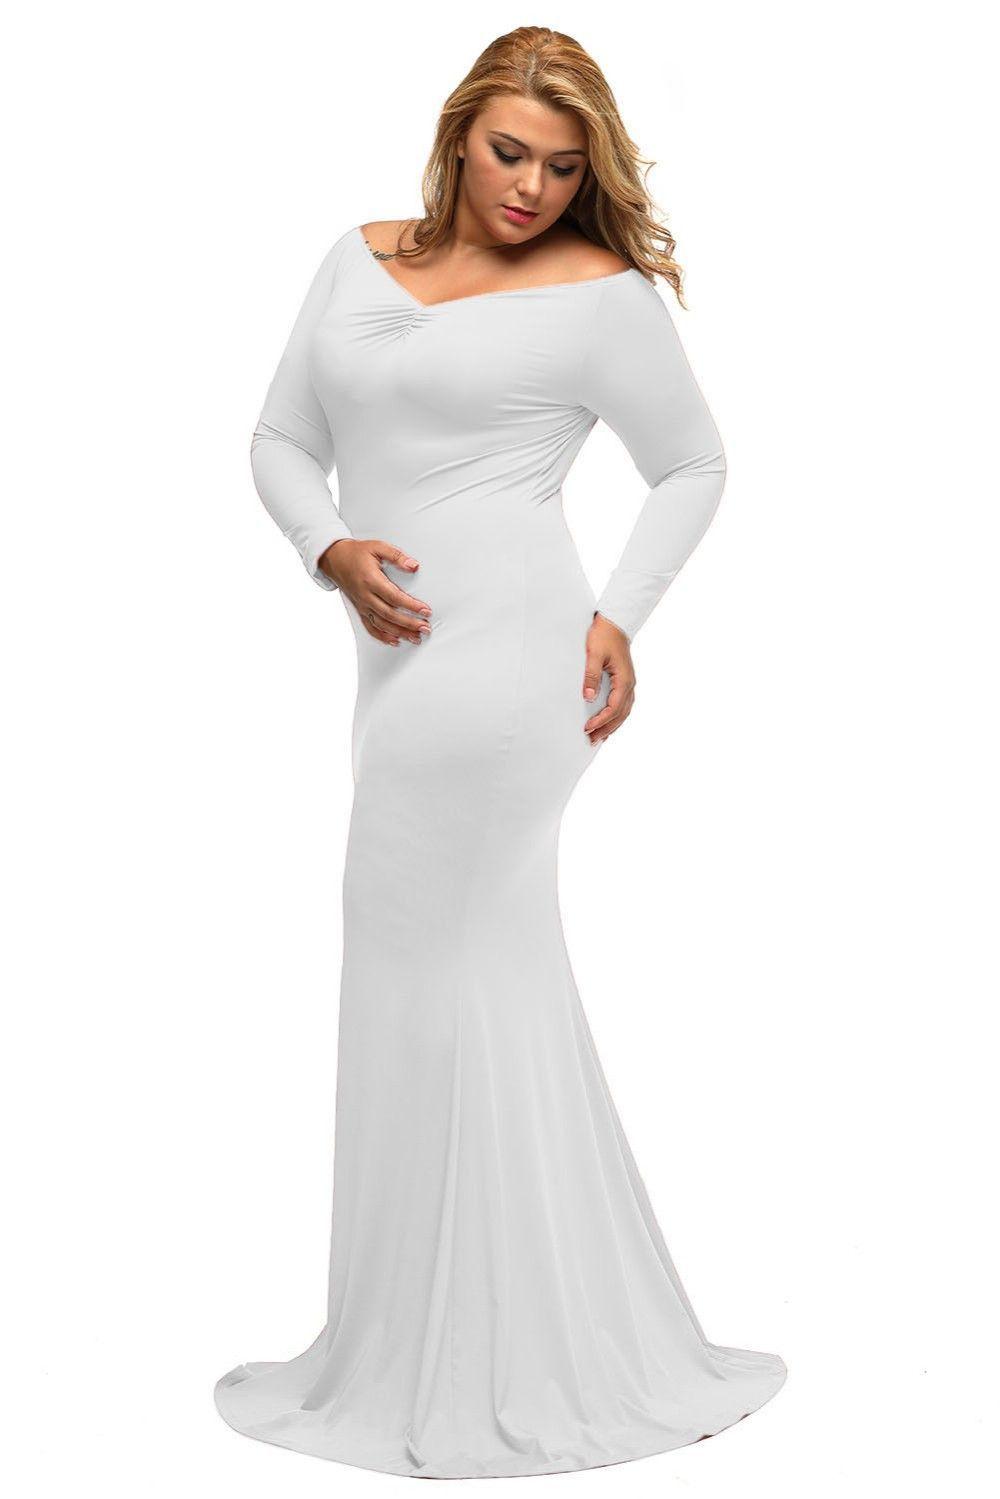 Plus size bling wedding dresses  Plus Sized Maxi dresses with V neck  vi beach elope